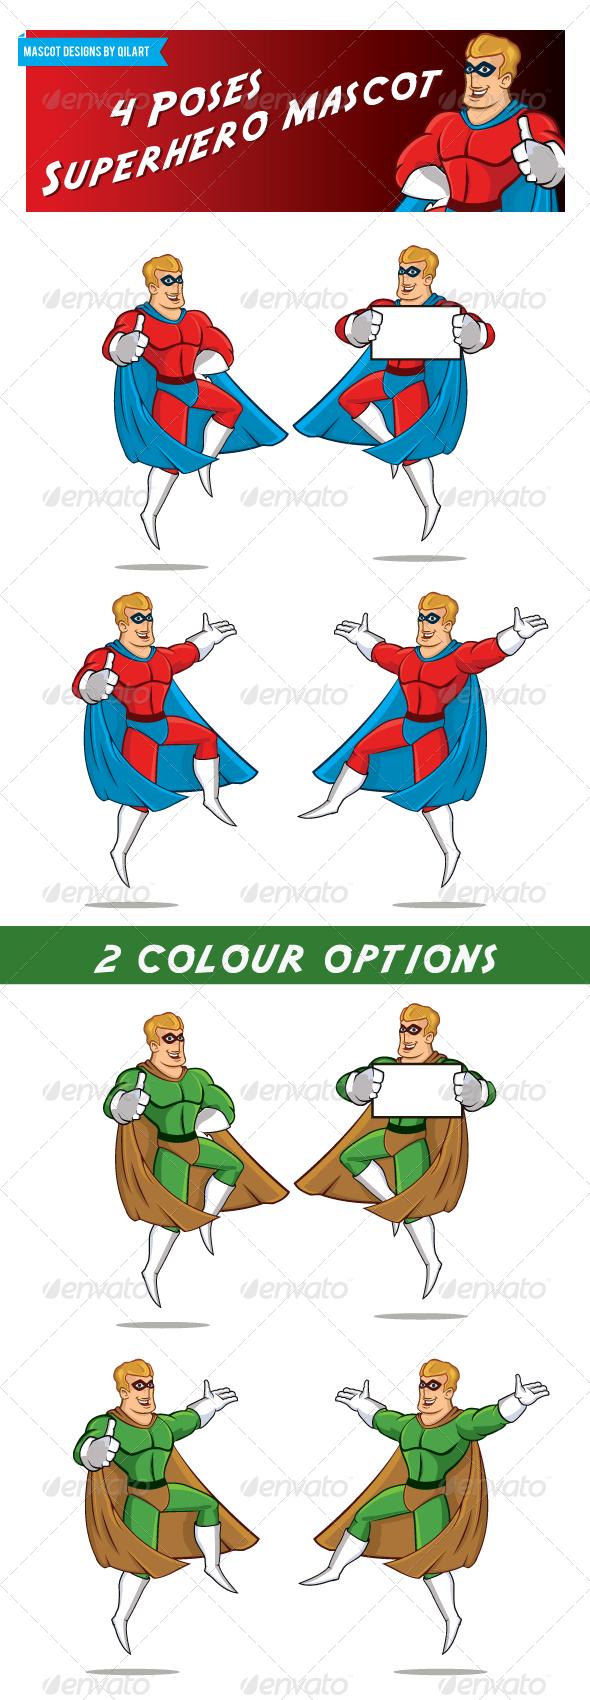 4 Pose Superhero Mascot